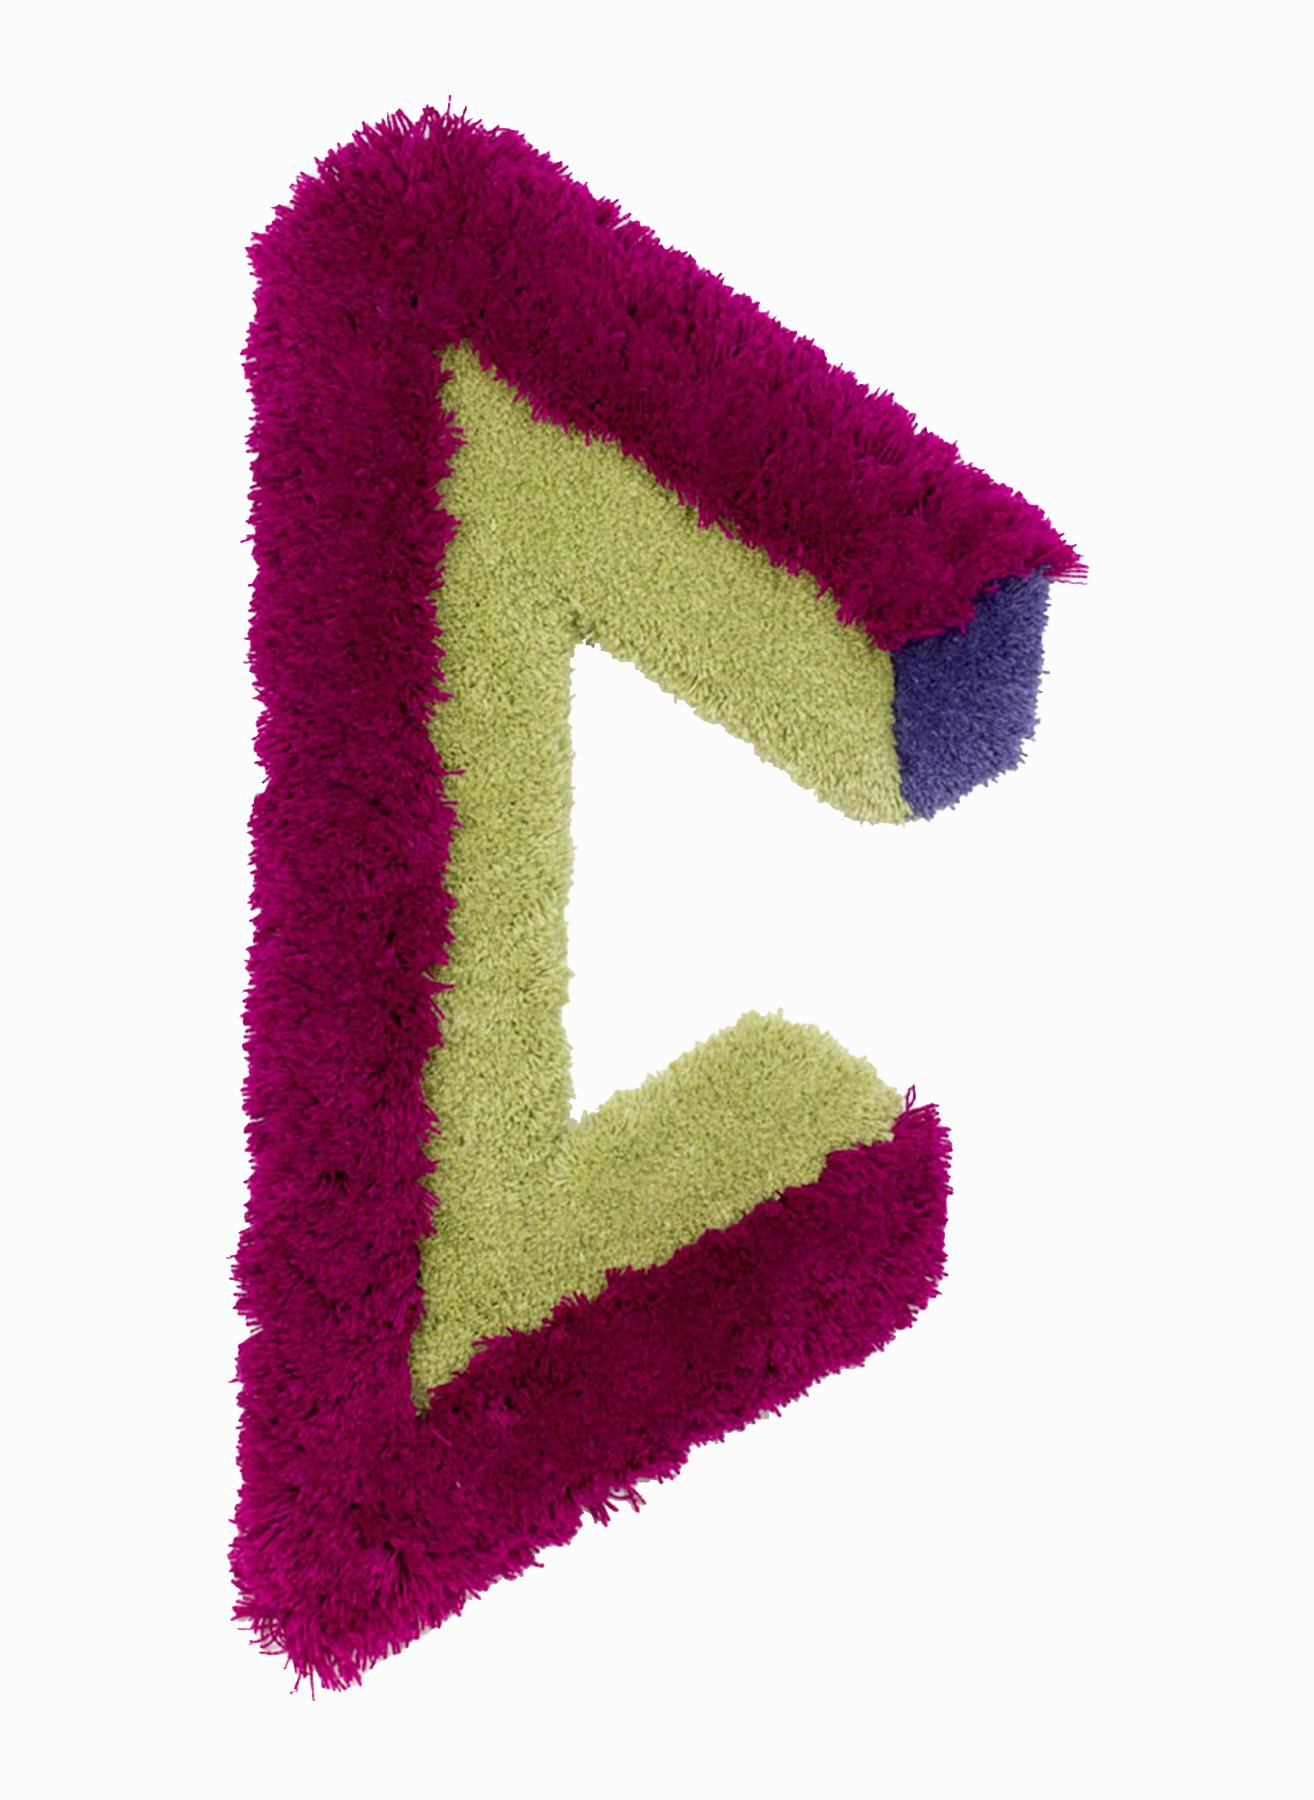 Bent Bracing, 35 x 16.5 inches / 88.9 cm x 41.9 cm, wool yarn on wood panel, 2019